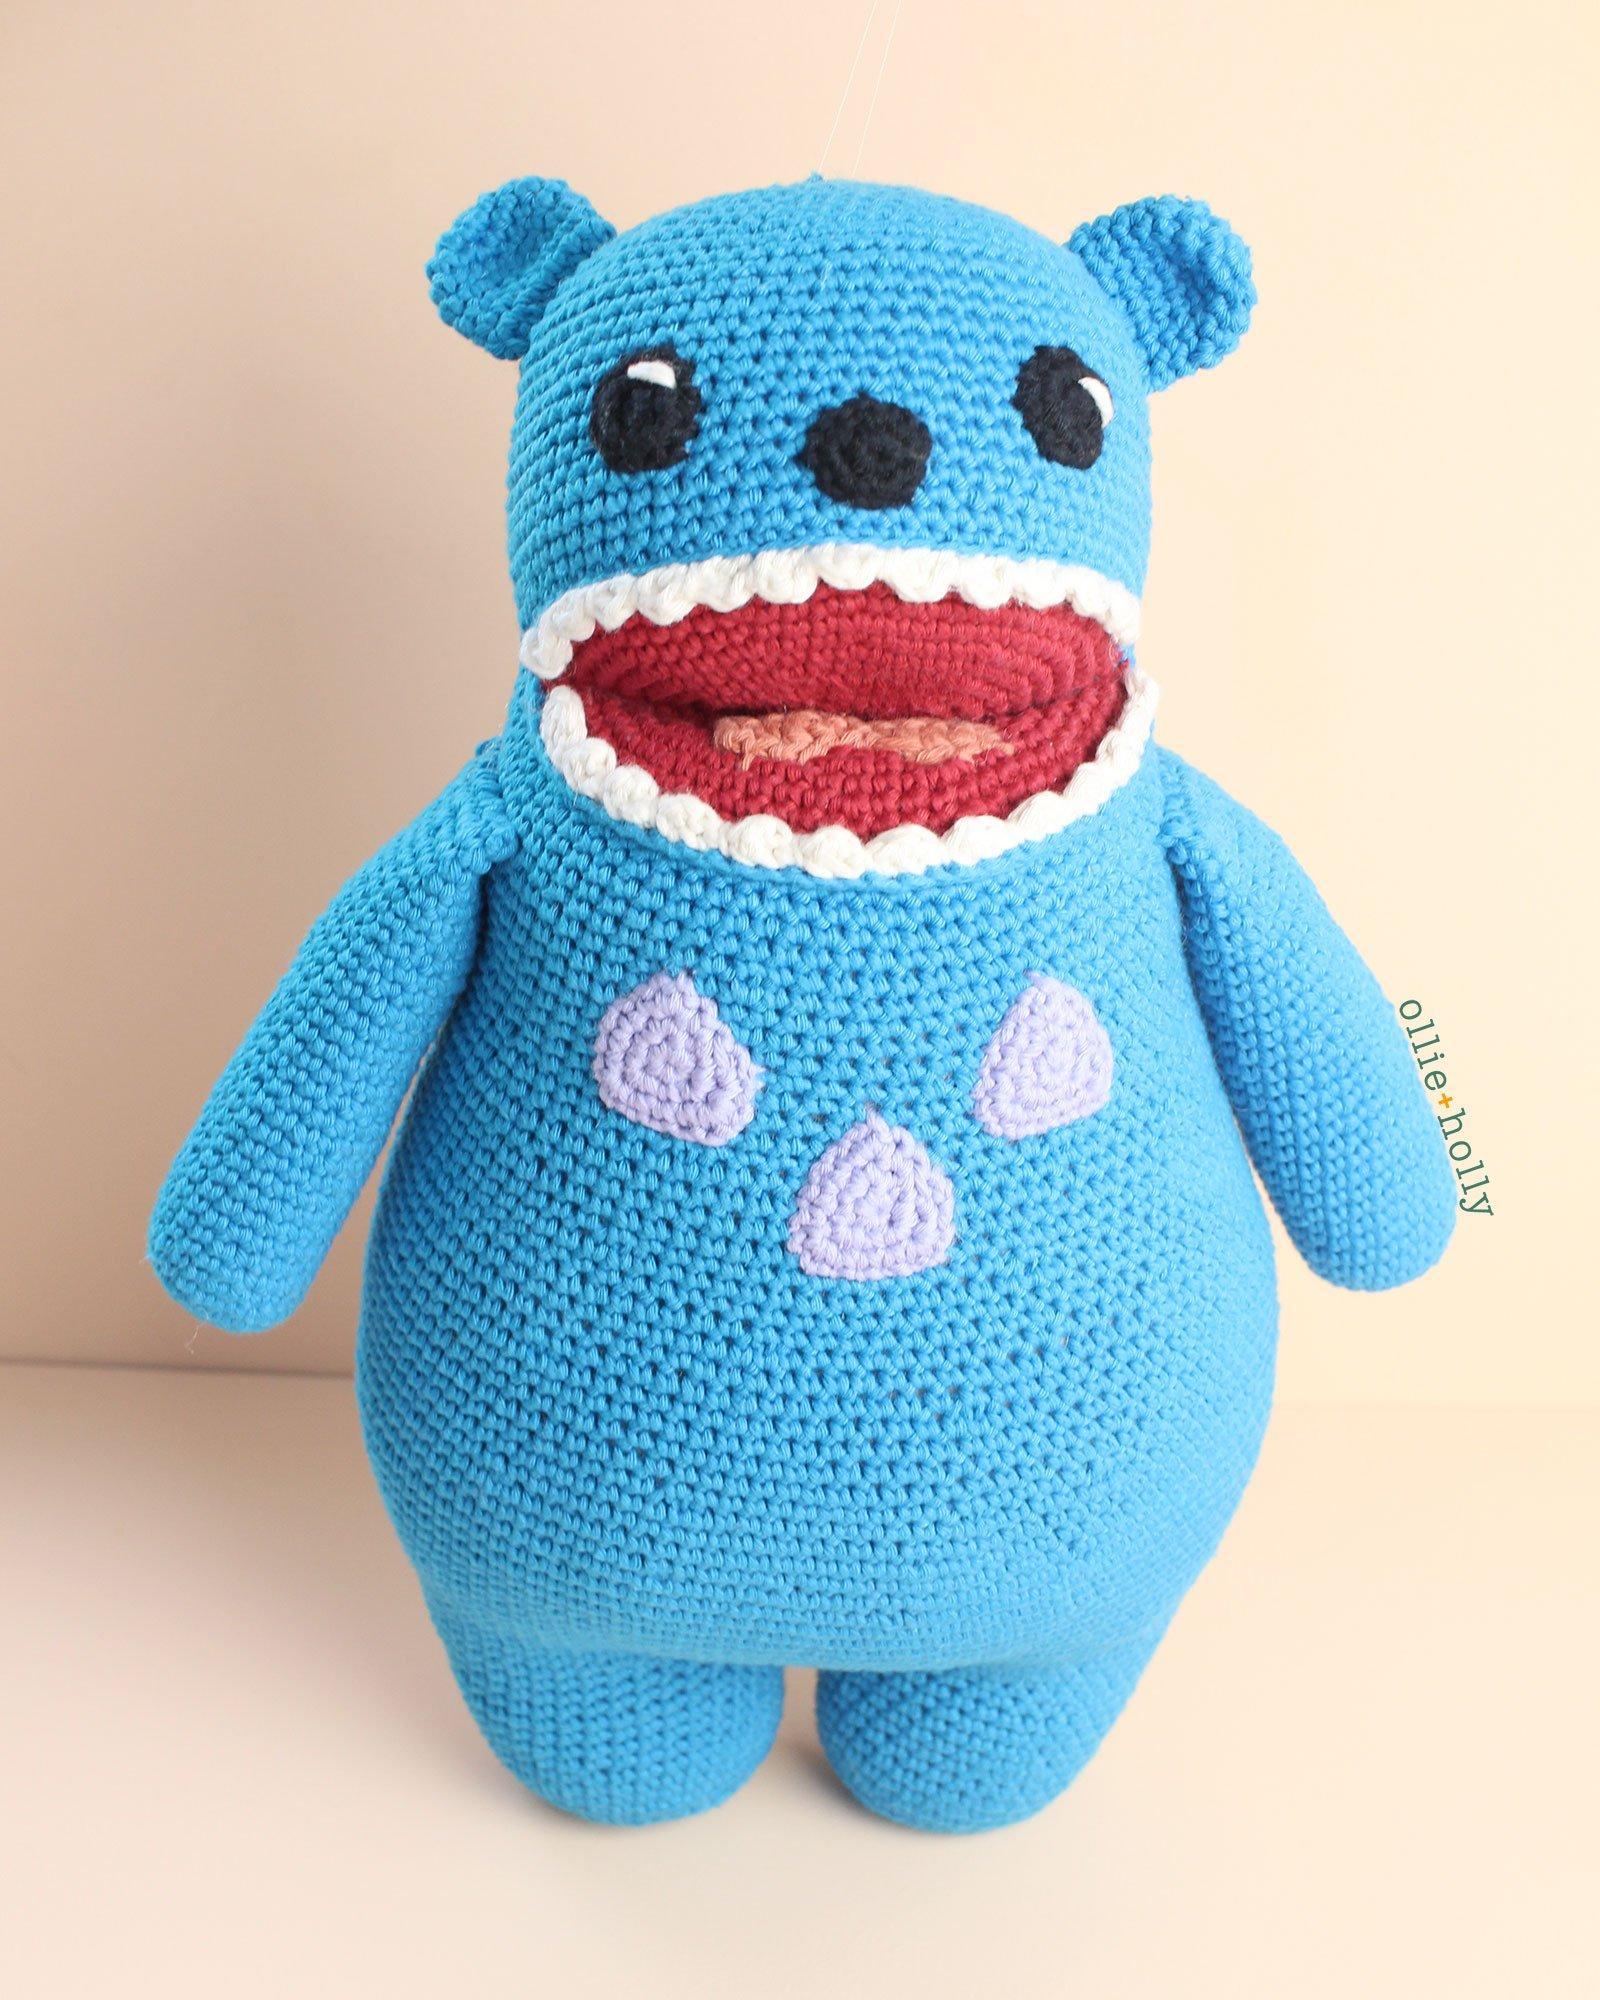 Bakeneko from Bob's Burgers Amigurumi Crochet Stuffed Toy Animal (Pattern Only)